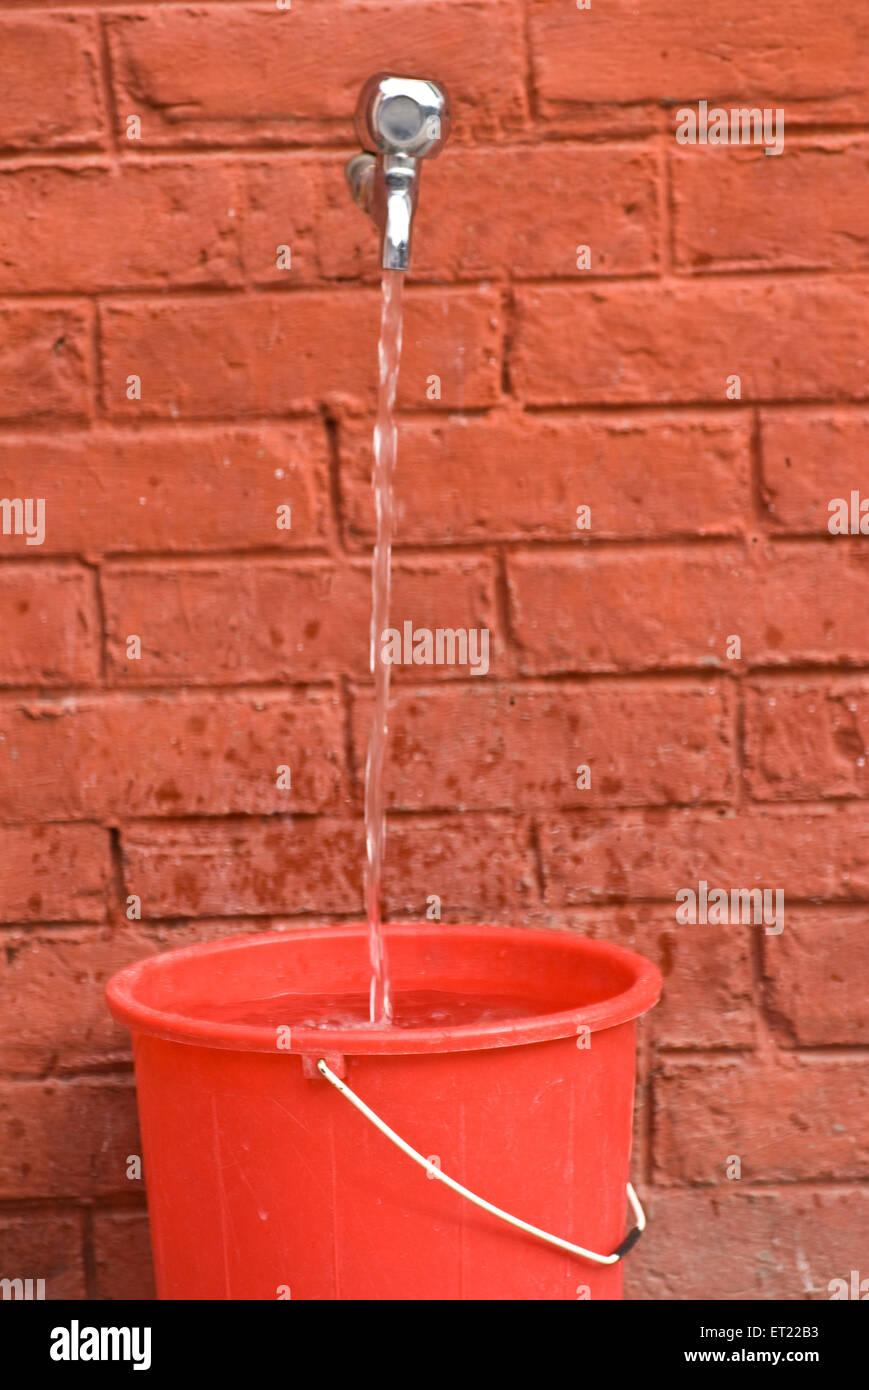 Tap water in bucket 2009 - Stock Image